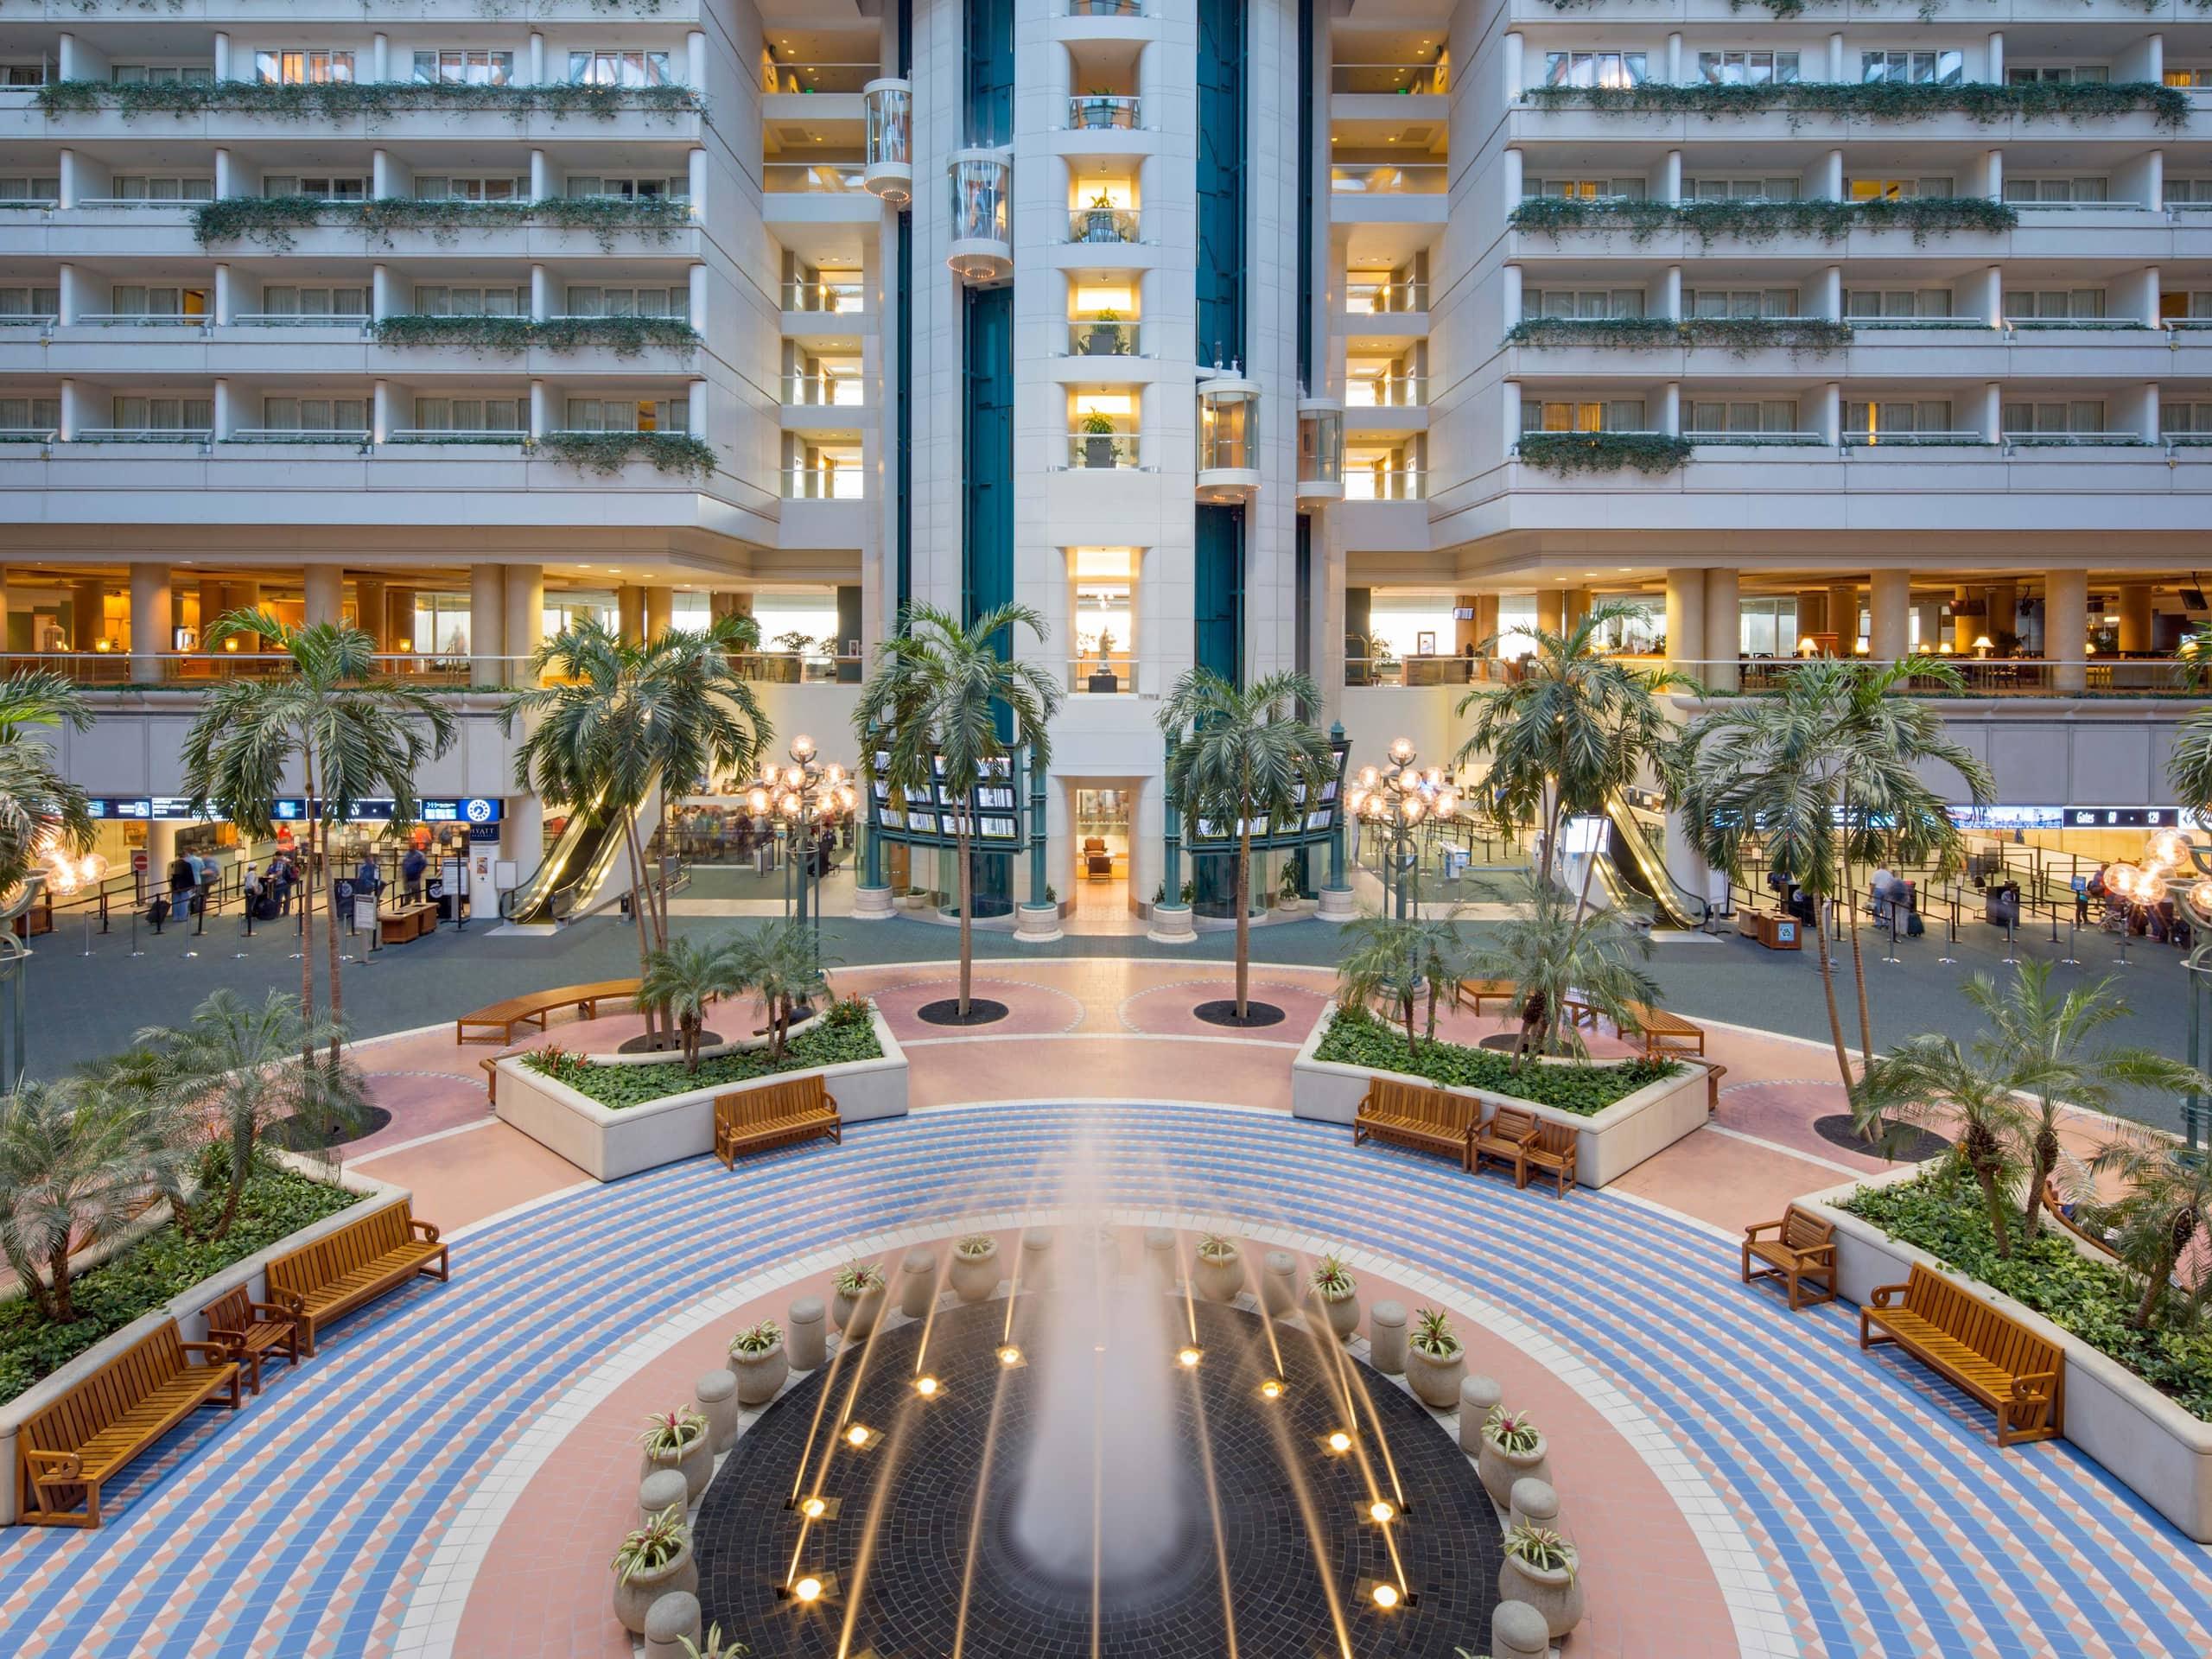 Mco Hotel Near Walt Disney World Hyatt Regency Orlando